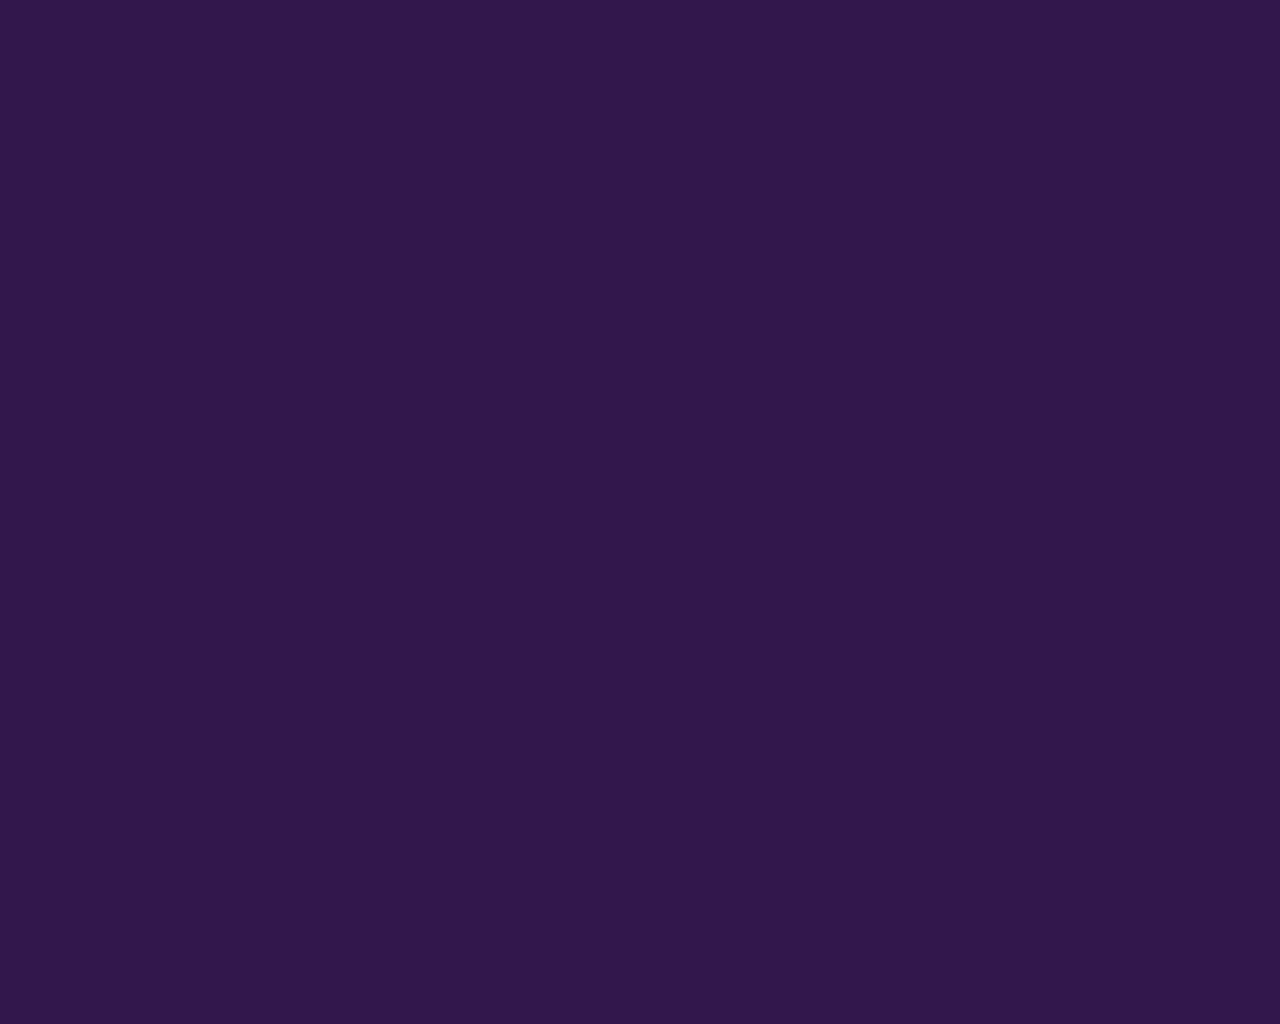 Dark Purple Color